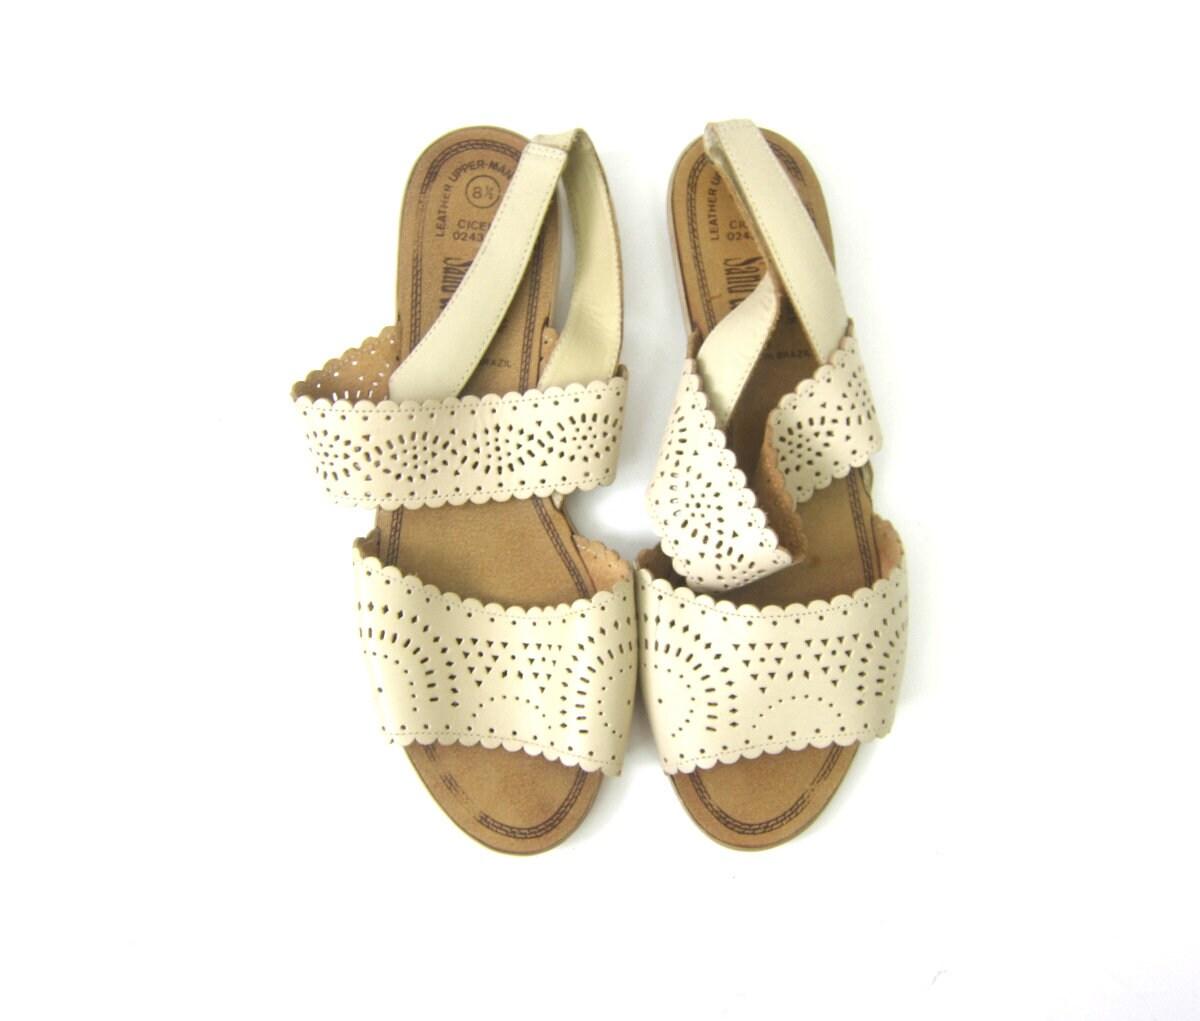 51b41df97ec27 Off White Leather Sandals Open Toe Huaraches Womens Beach ...